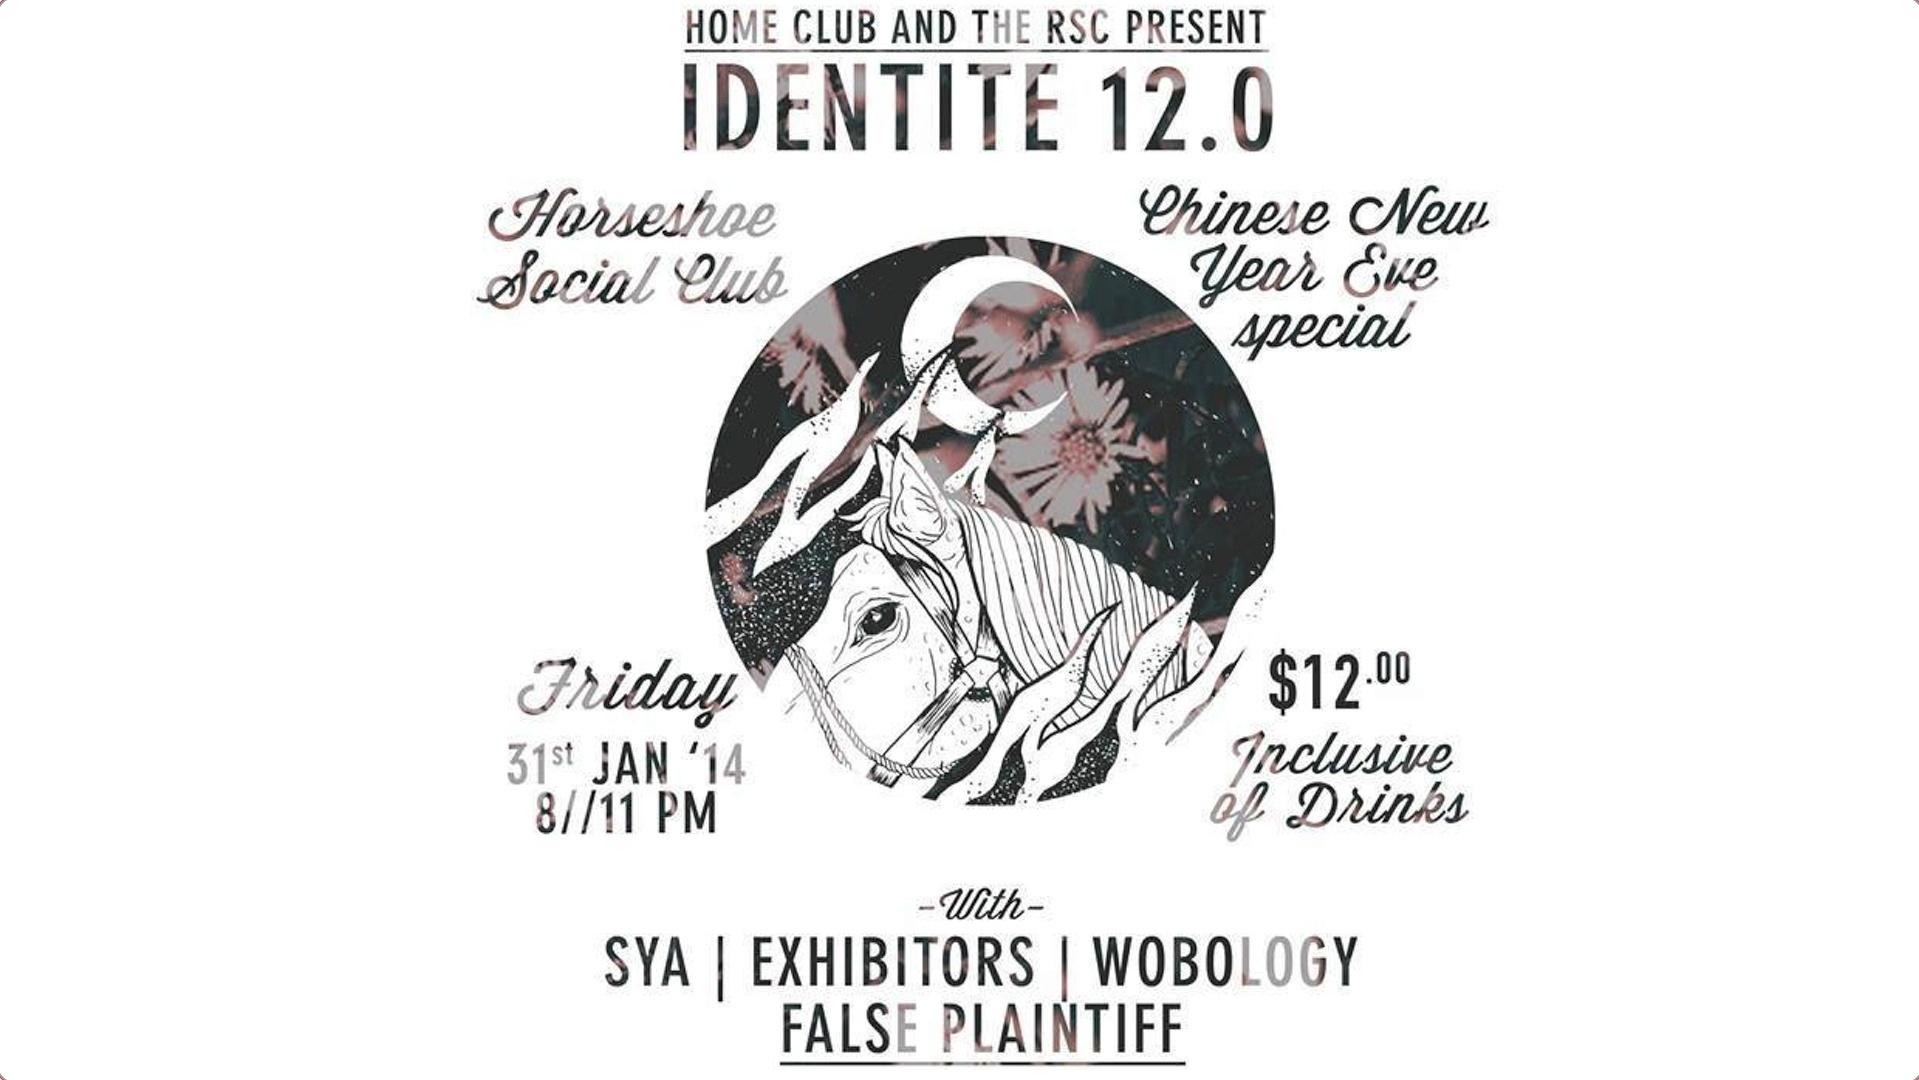 Identite: Horse Shoe Social Club